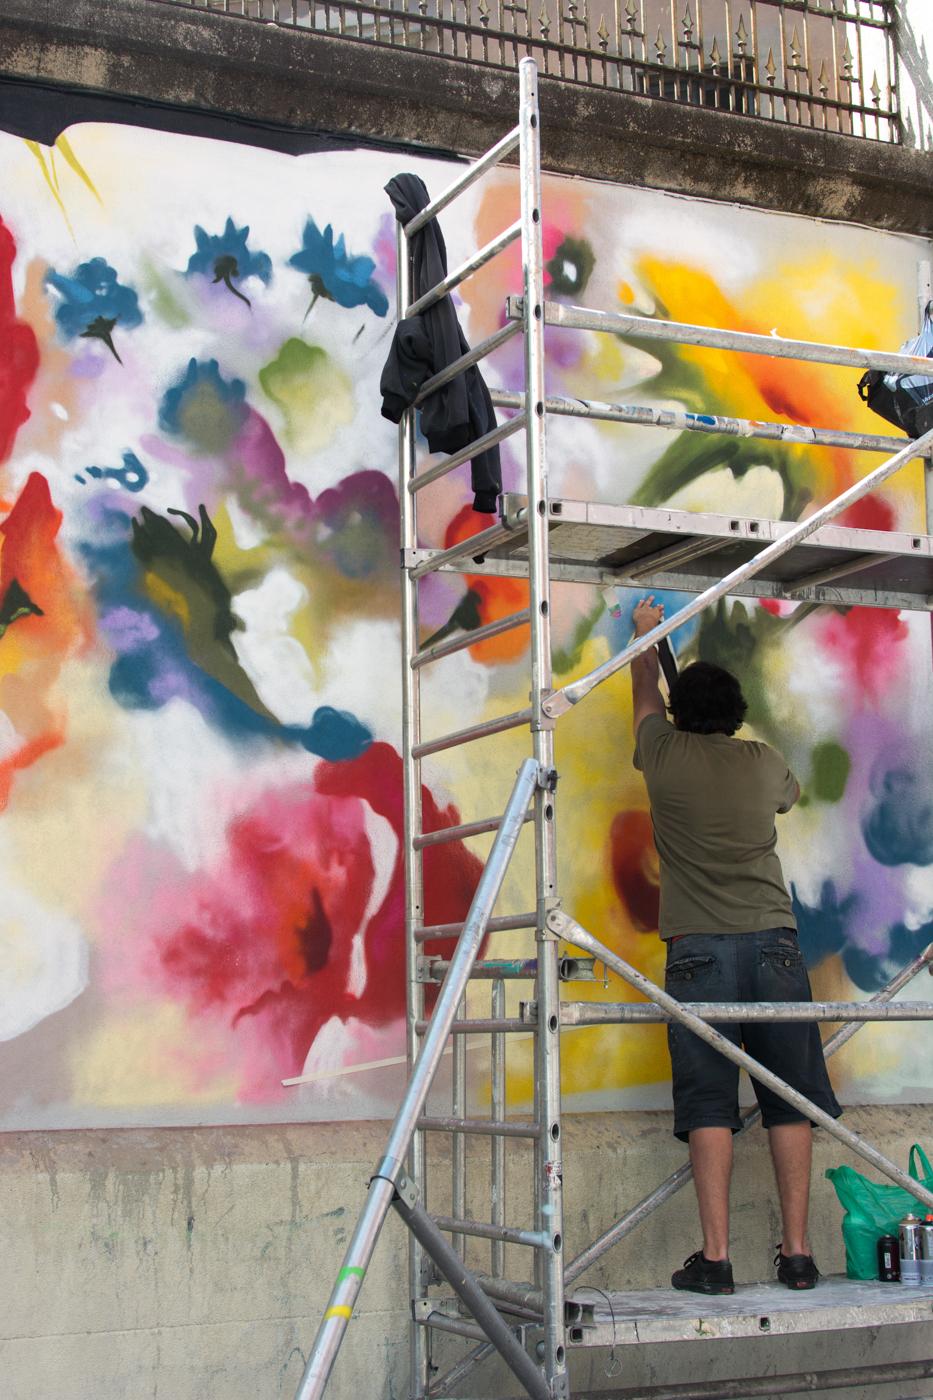 Digo Diego - MurosTabacalera by Guillermo de la Madrid - Madrid Street Art Project -17-004.jpg